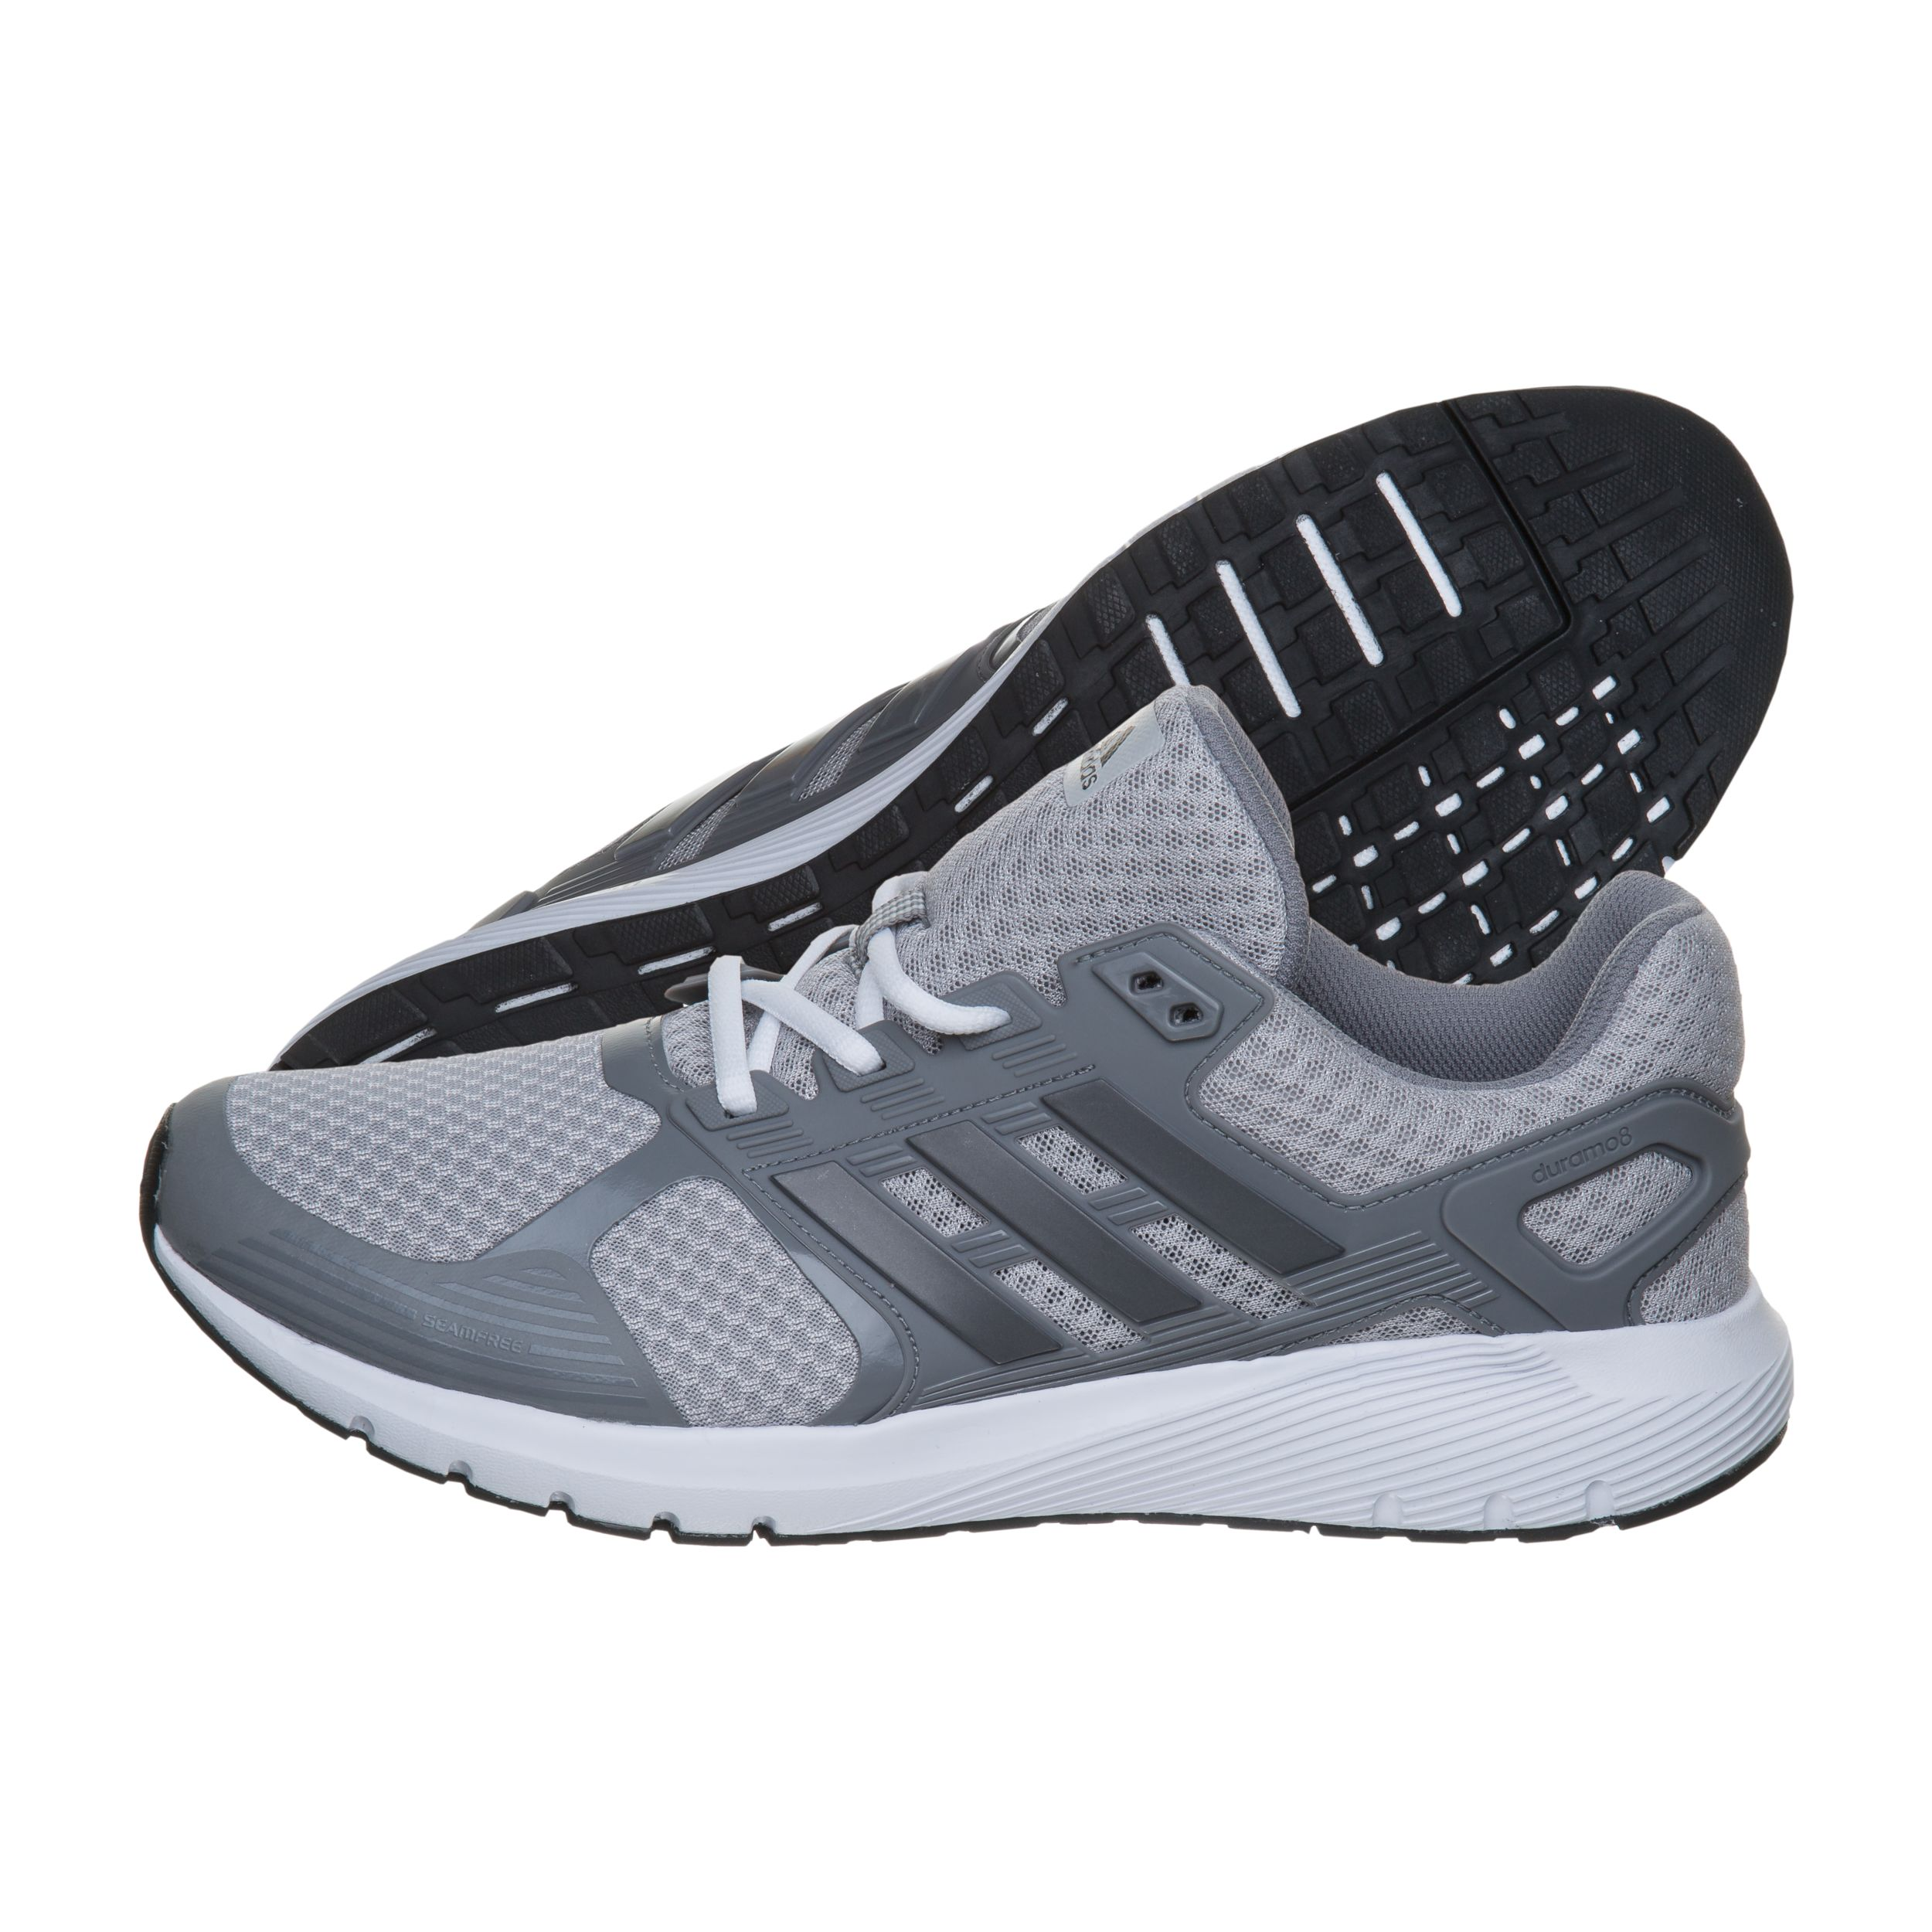 Teamsport Philipp   Adidas Duramo 8 40 BA8082   günstig online kaufen 7bac135546